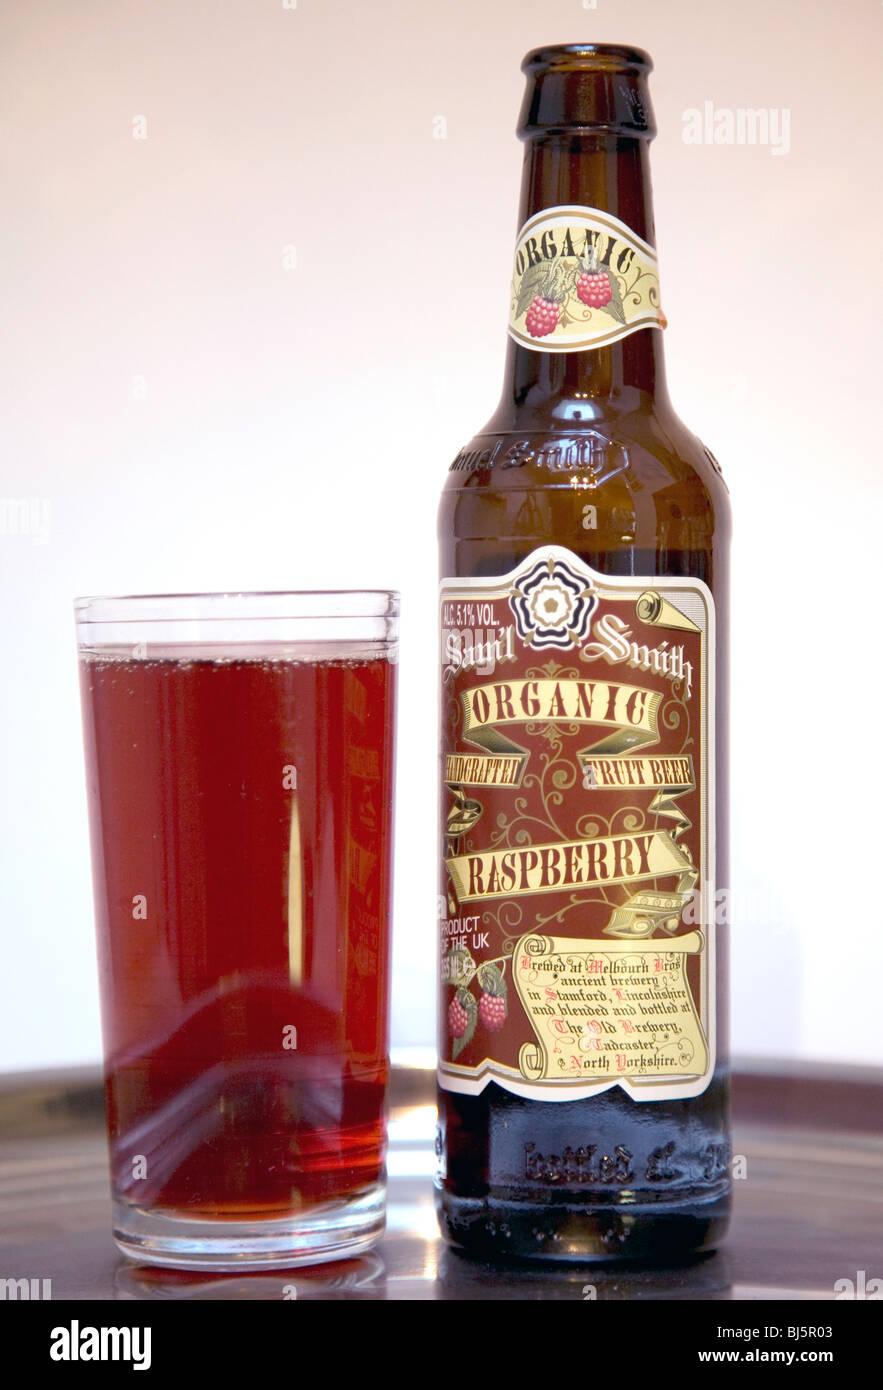 Samuel Smiths Organic Fruit Beer Glass